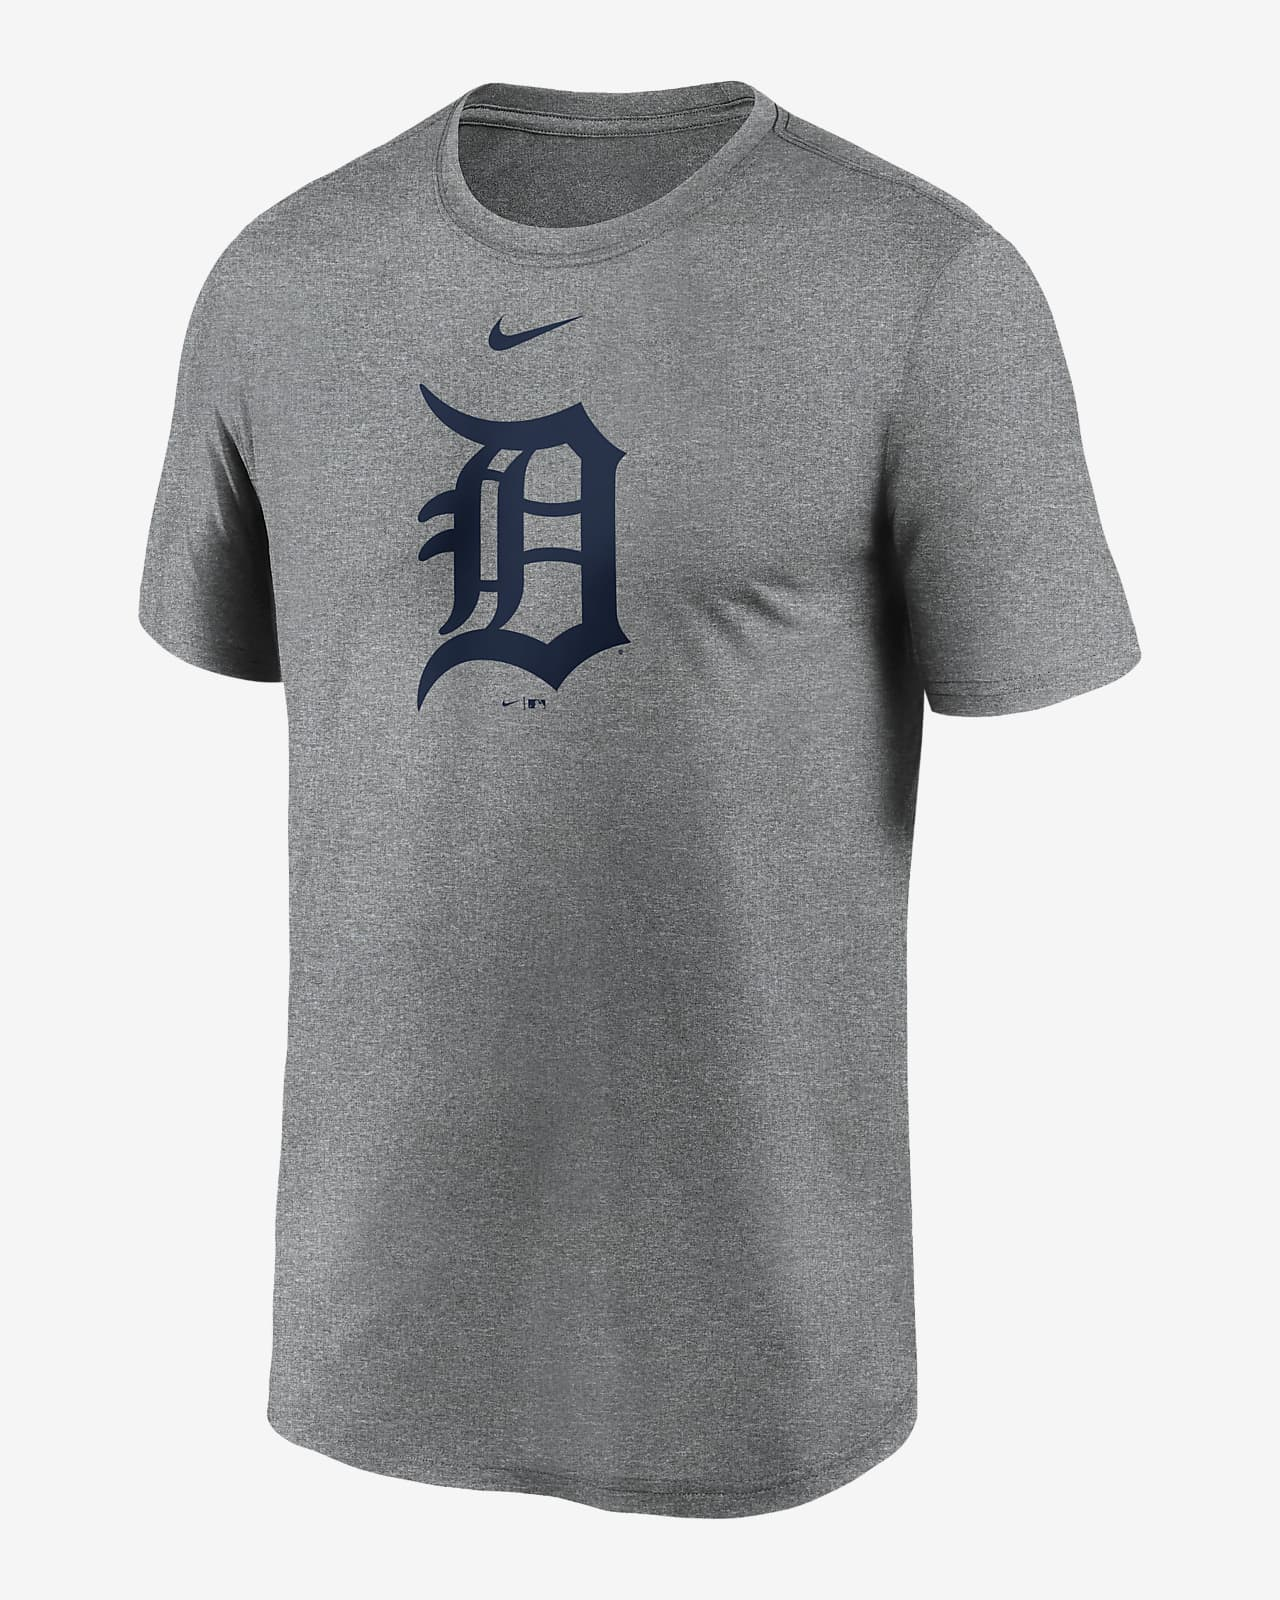 Nike Dri-FIT Logo Legend (MLB Detroit Tigers) Men's T-Shirt